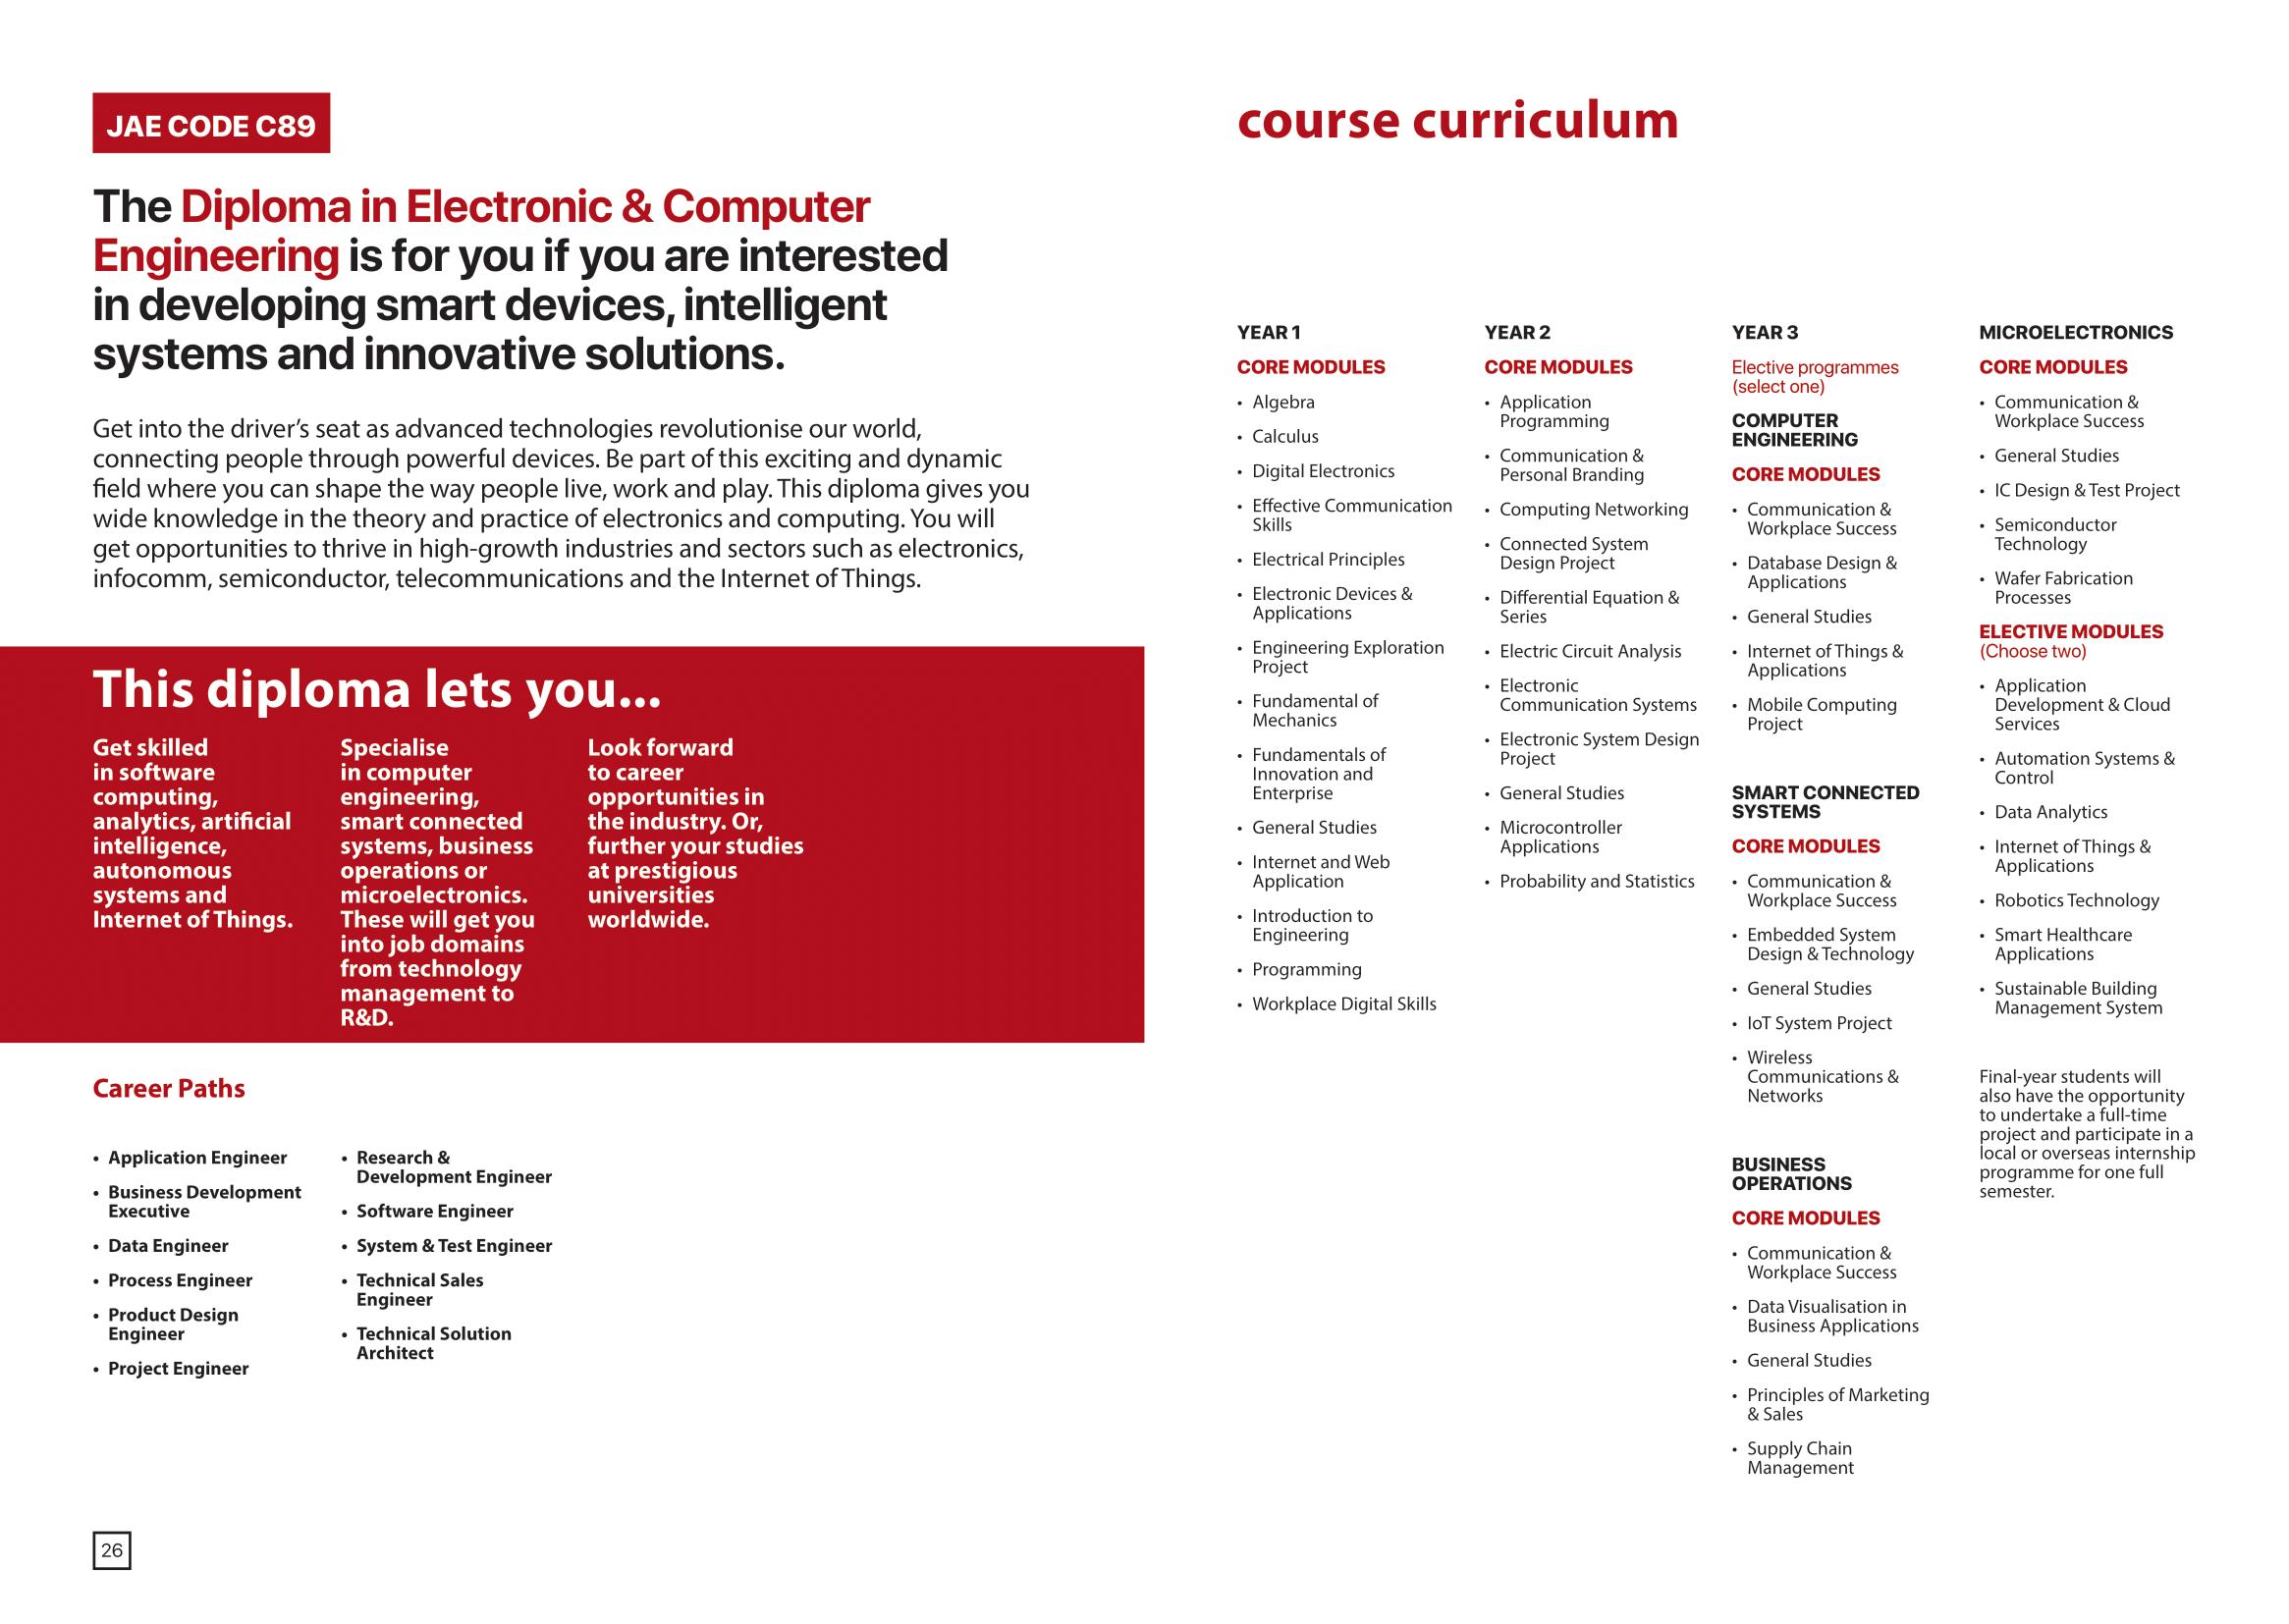 School of Engineering 2020-15